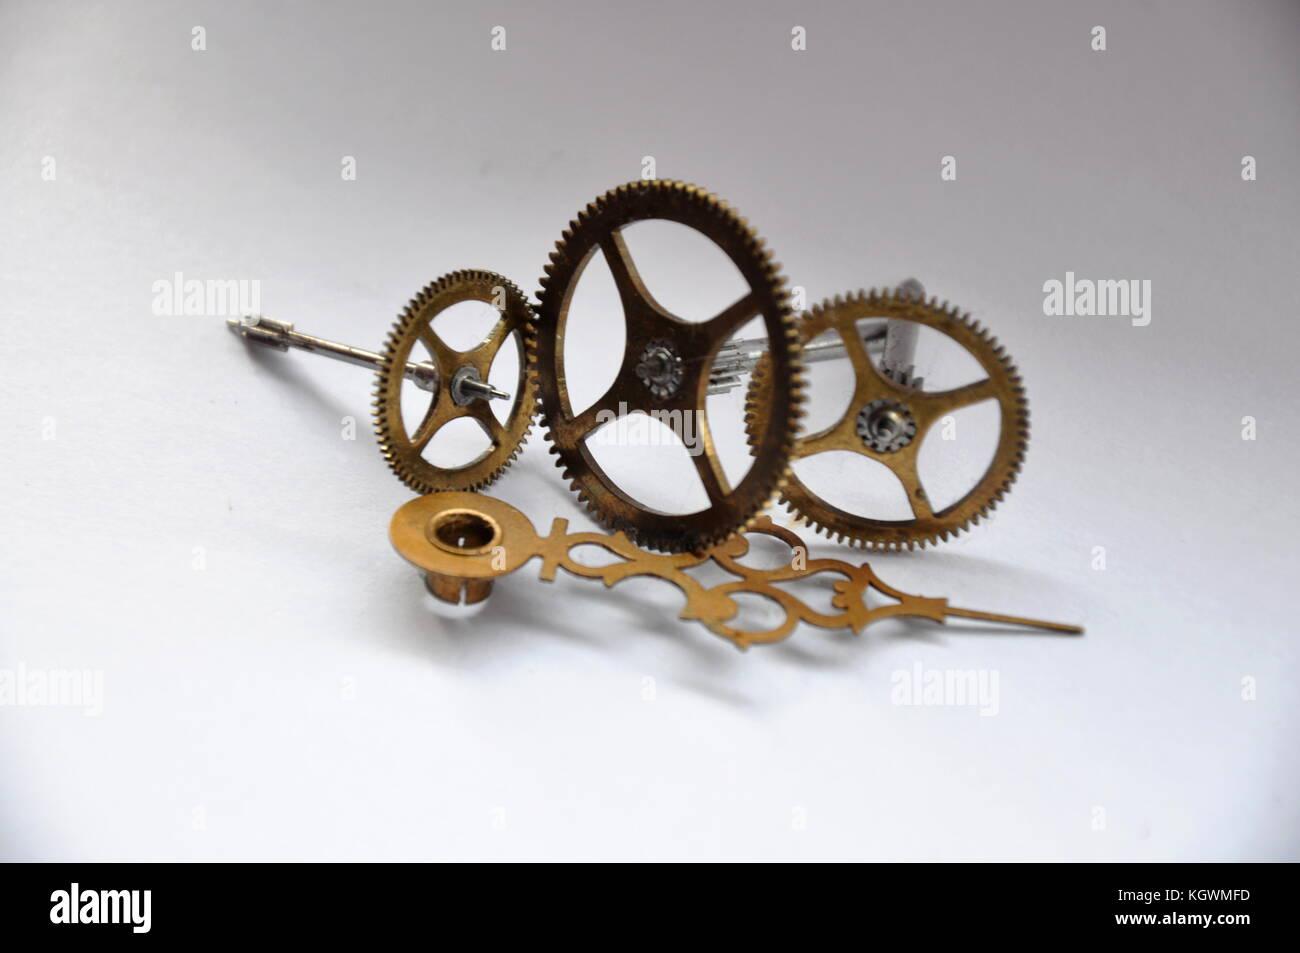 clock spares antique cog wheels - Stock Image